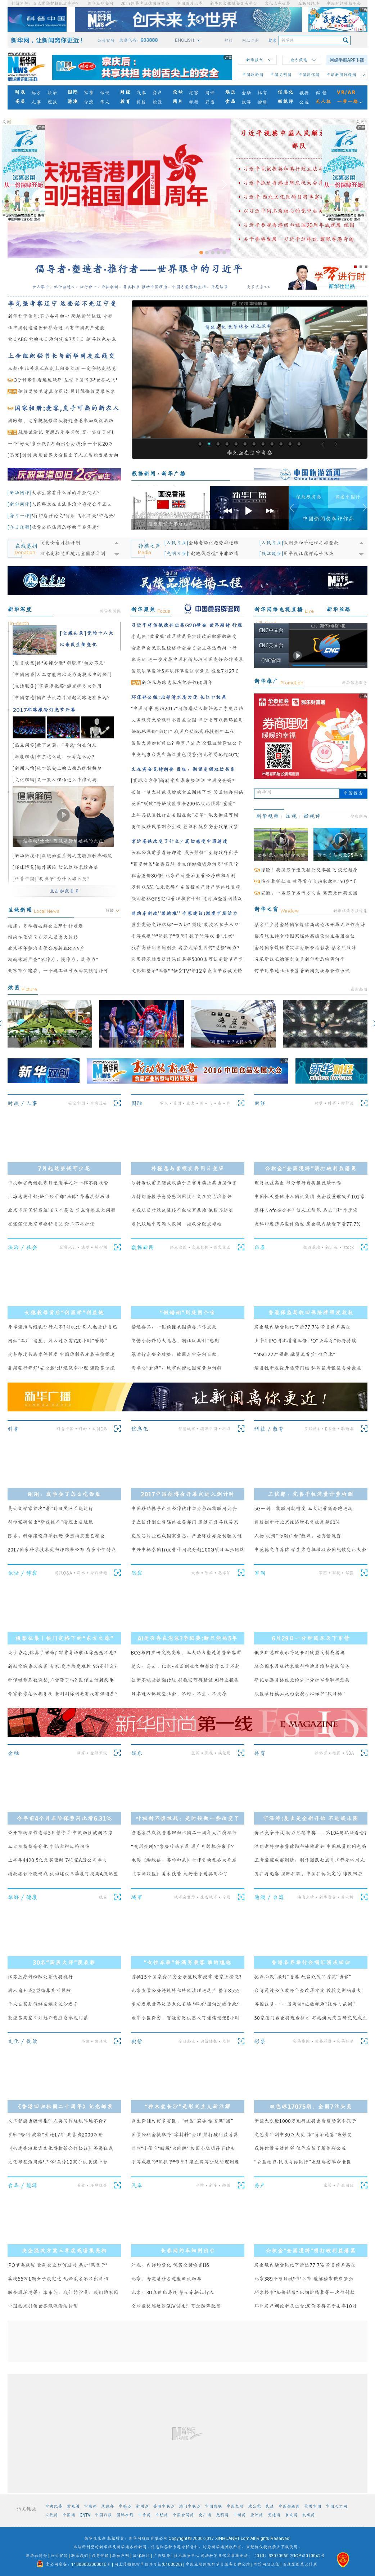 Xinhua at Friday June 30, 2017, 2:25 a.m. UTC